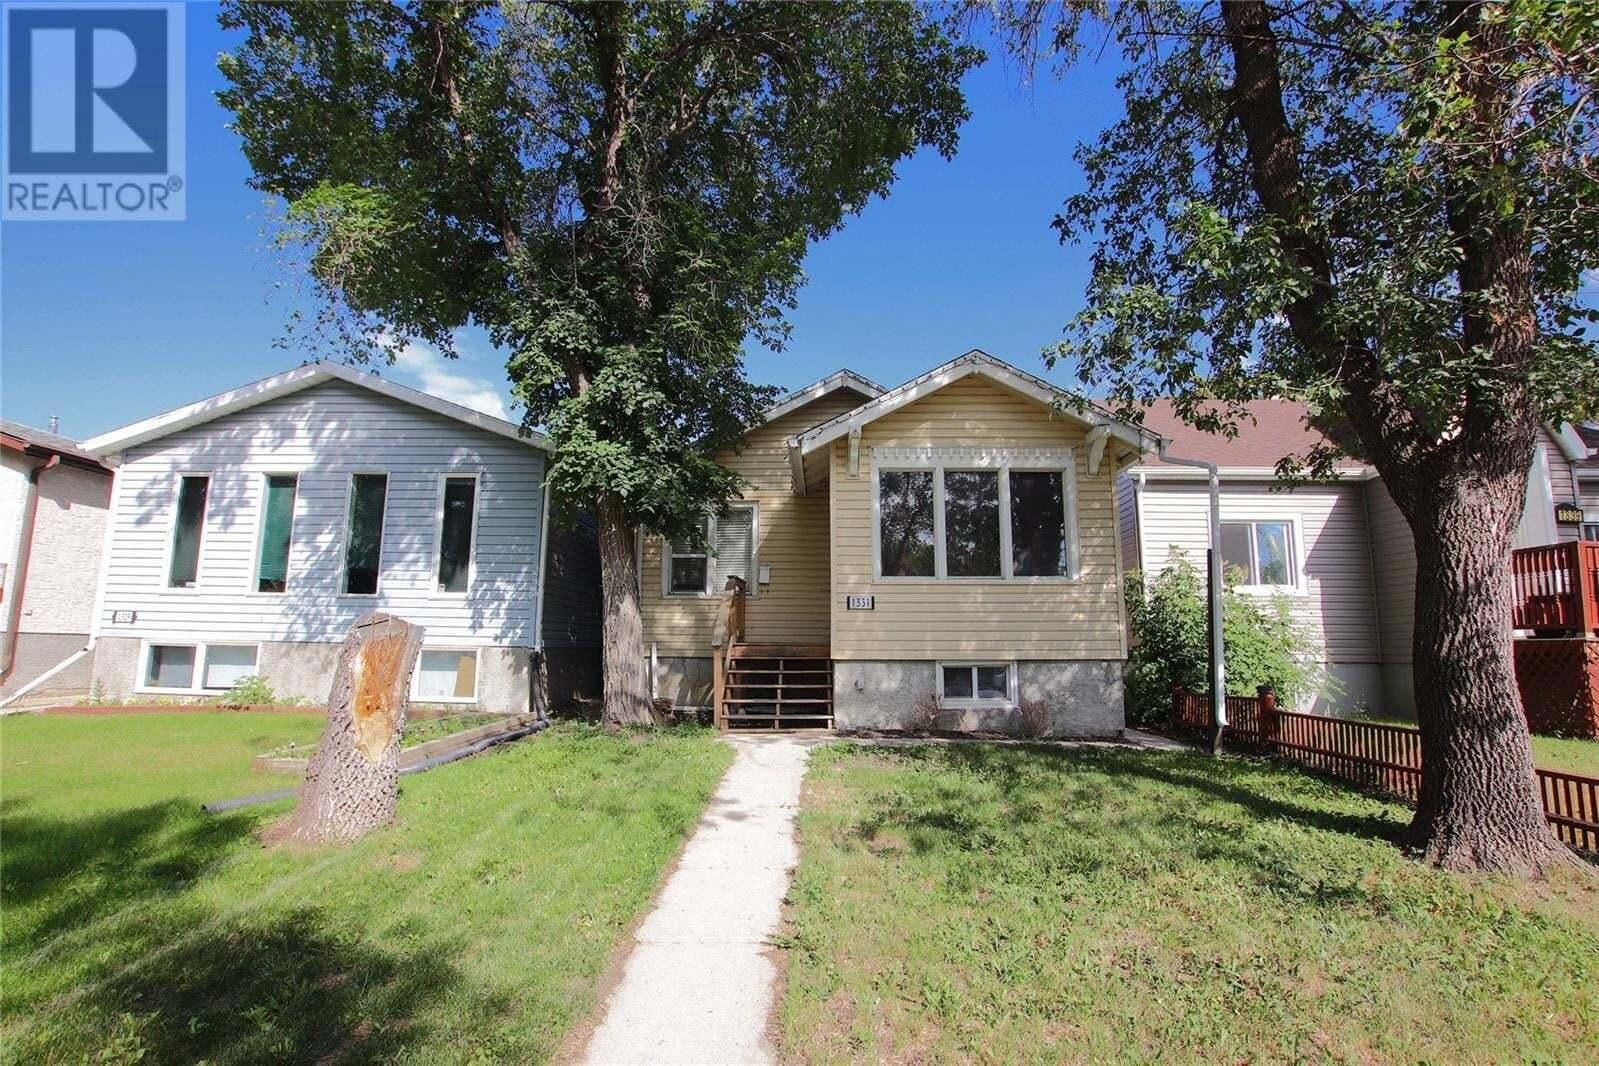 House for sale at 1331 Queen St Regina Saskatchewan - MLS: SK821399